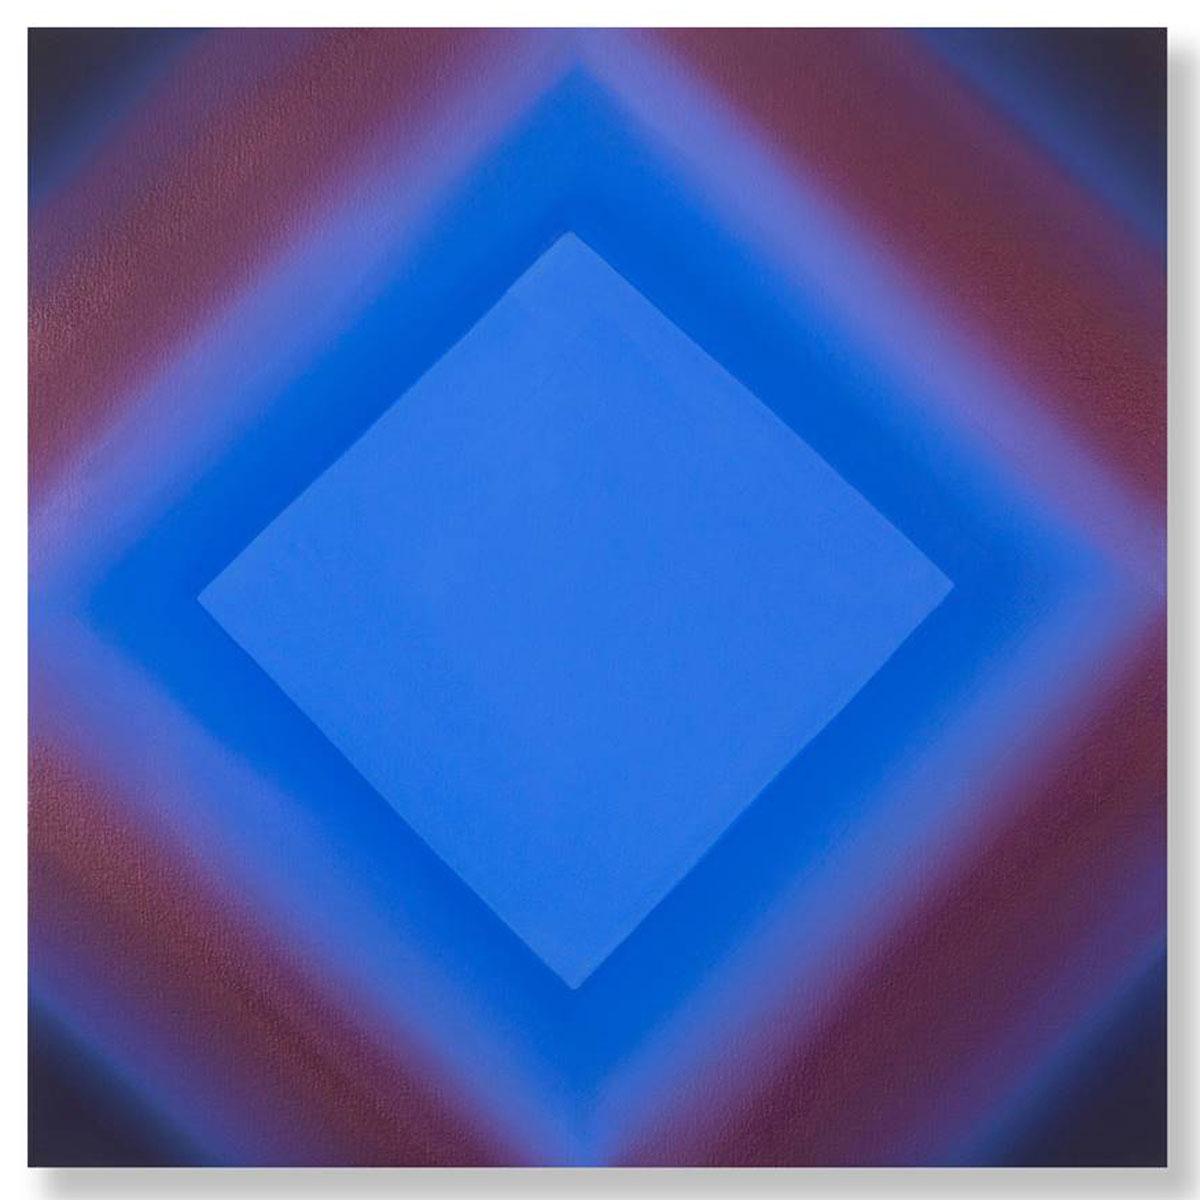 Matter of Light 14-S2424, (Blue Orange), Matter of Light Series, 2017, oil on canvas on custom beveled stretcher, 24 x 24 x 3 in. (61 x 61 x 7 in.)